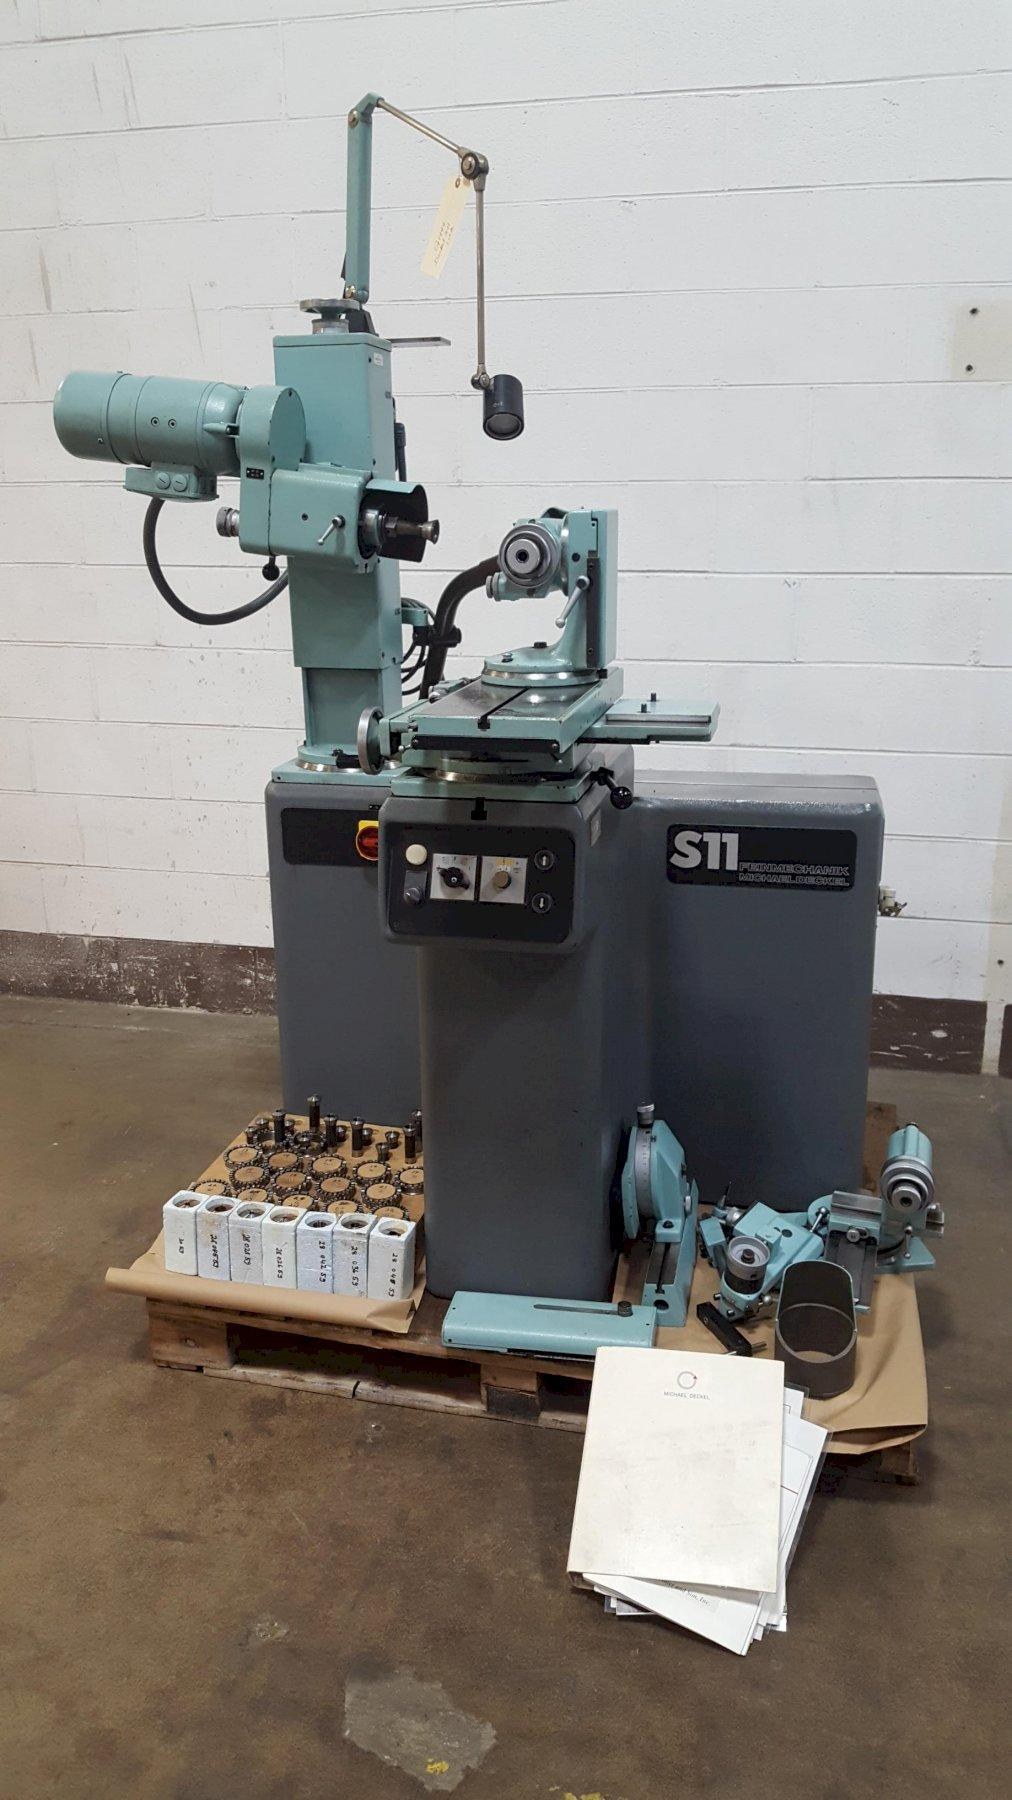 Deckel Model S11 Universal Tool & Cutter Grinder